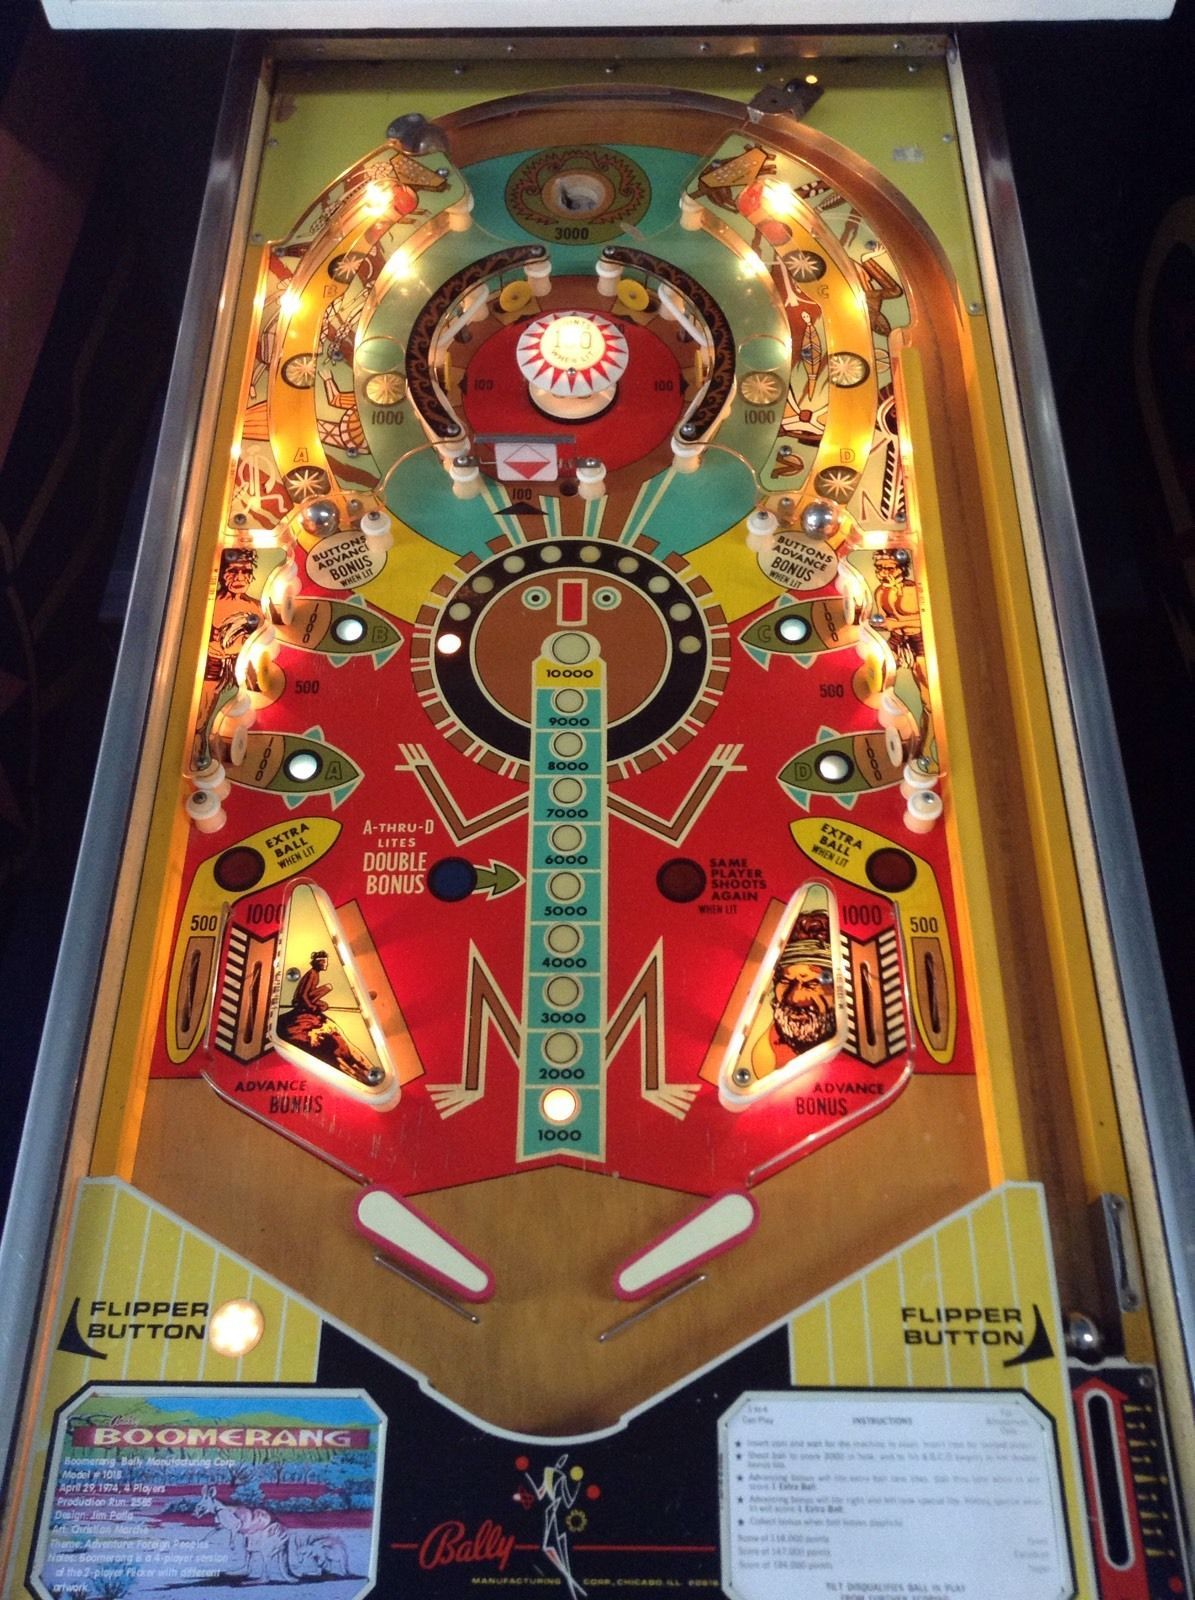 Bally Boomerang Pinball Playfield 1974 Arcade Game Room Pinball Pinball Game